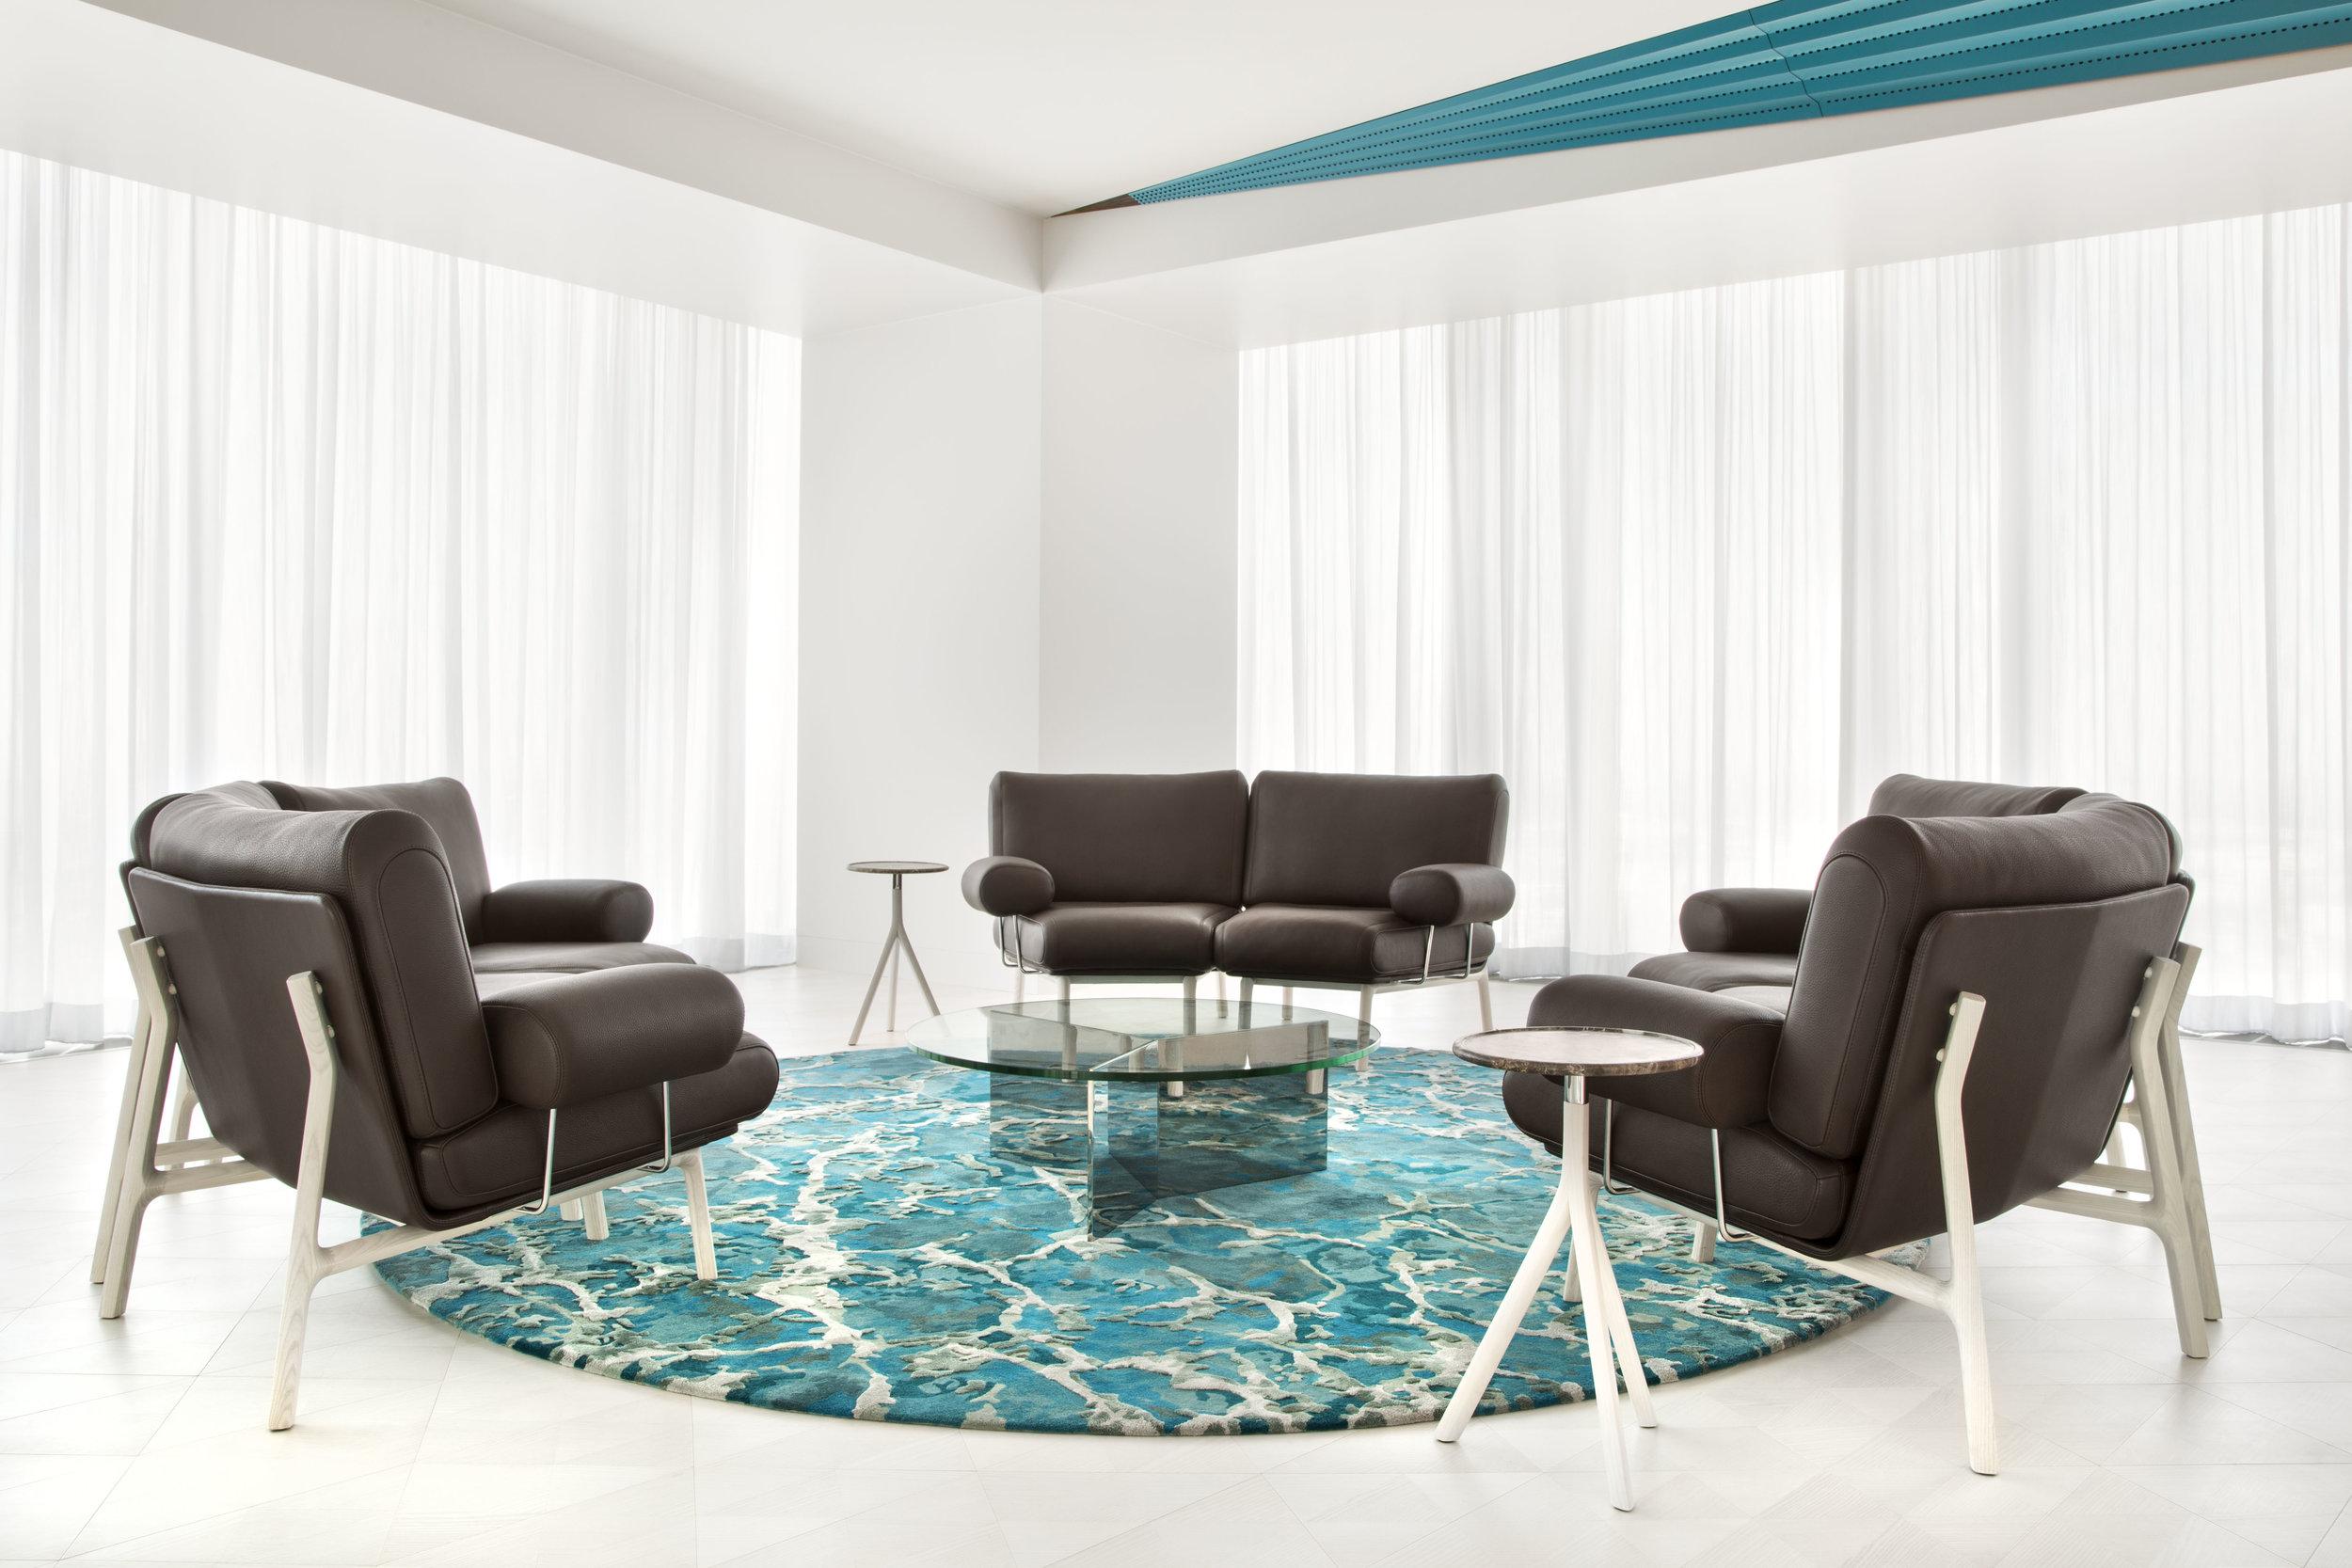 medeo-sofa_furniture-design_coordination-berlin_01.jpg